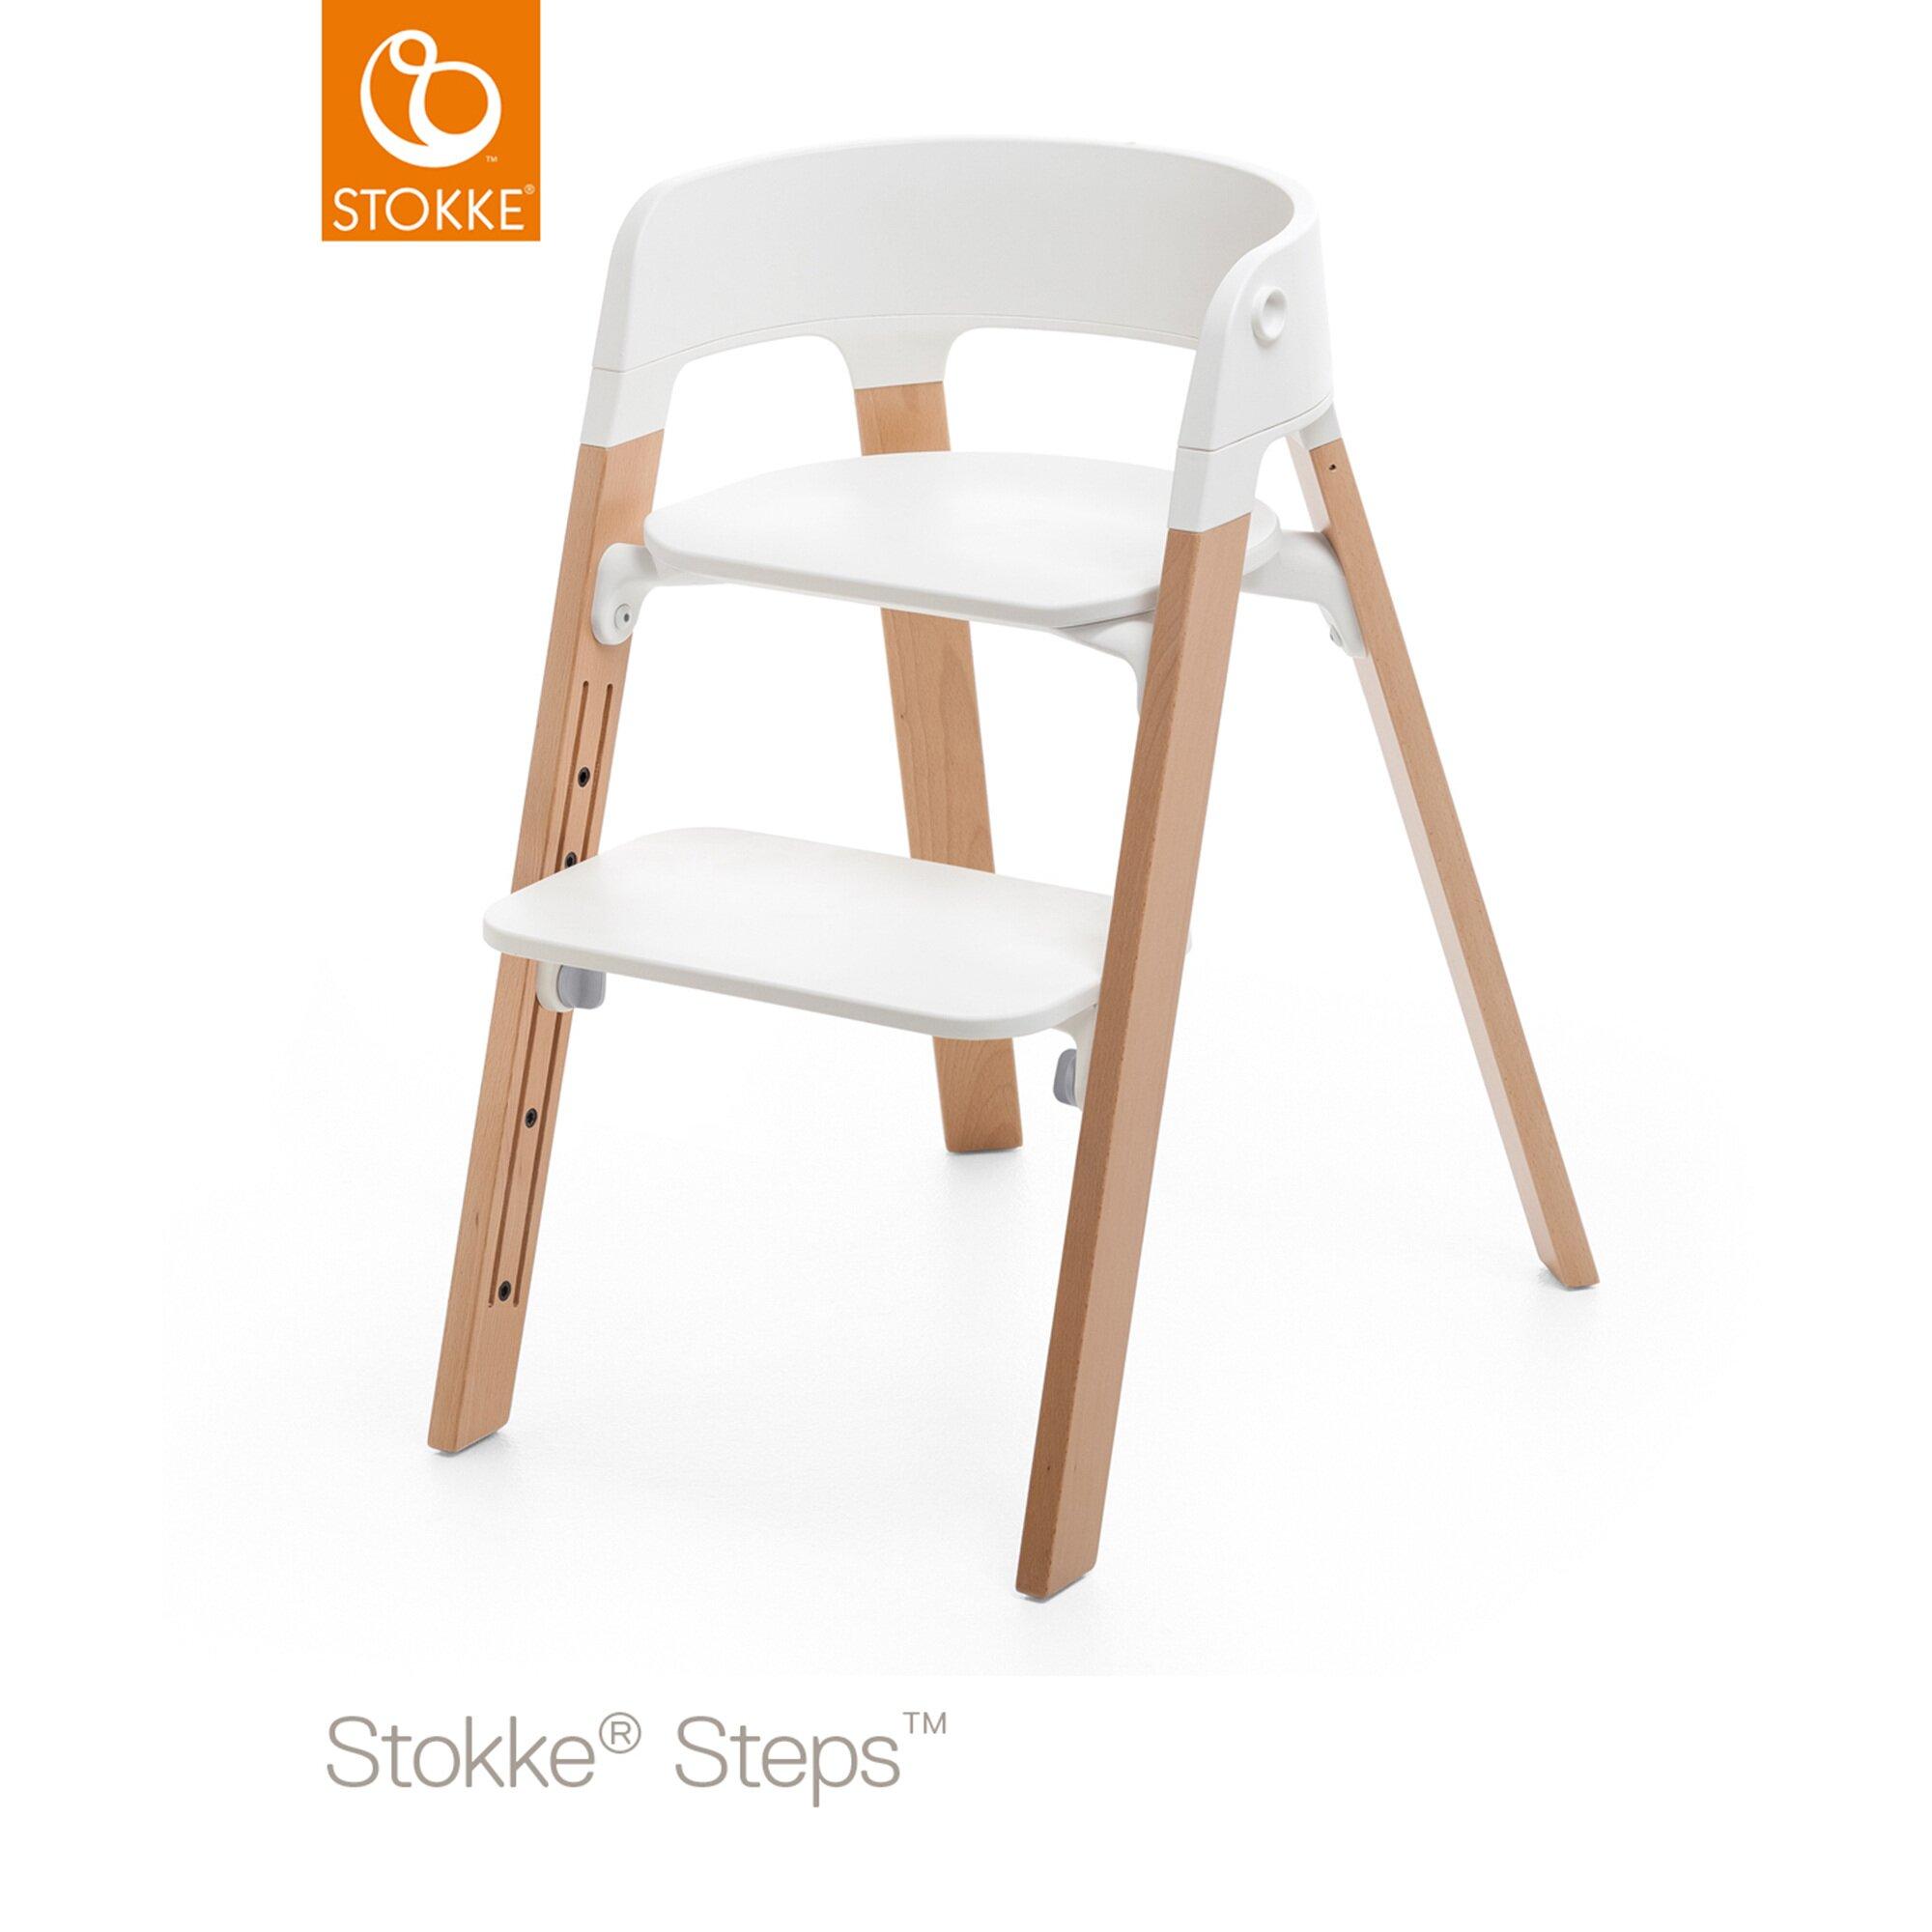 steps-stokke-steps-beine-buche-natur